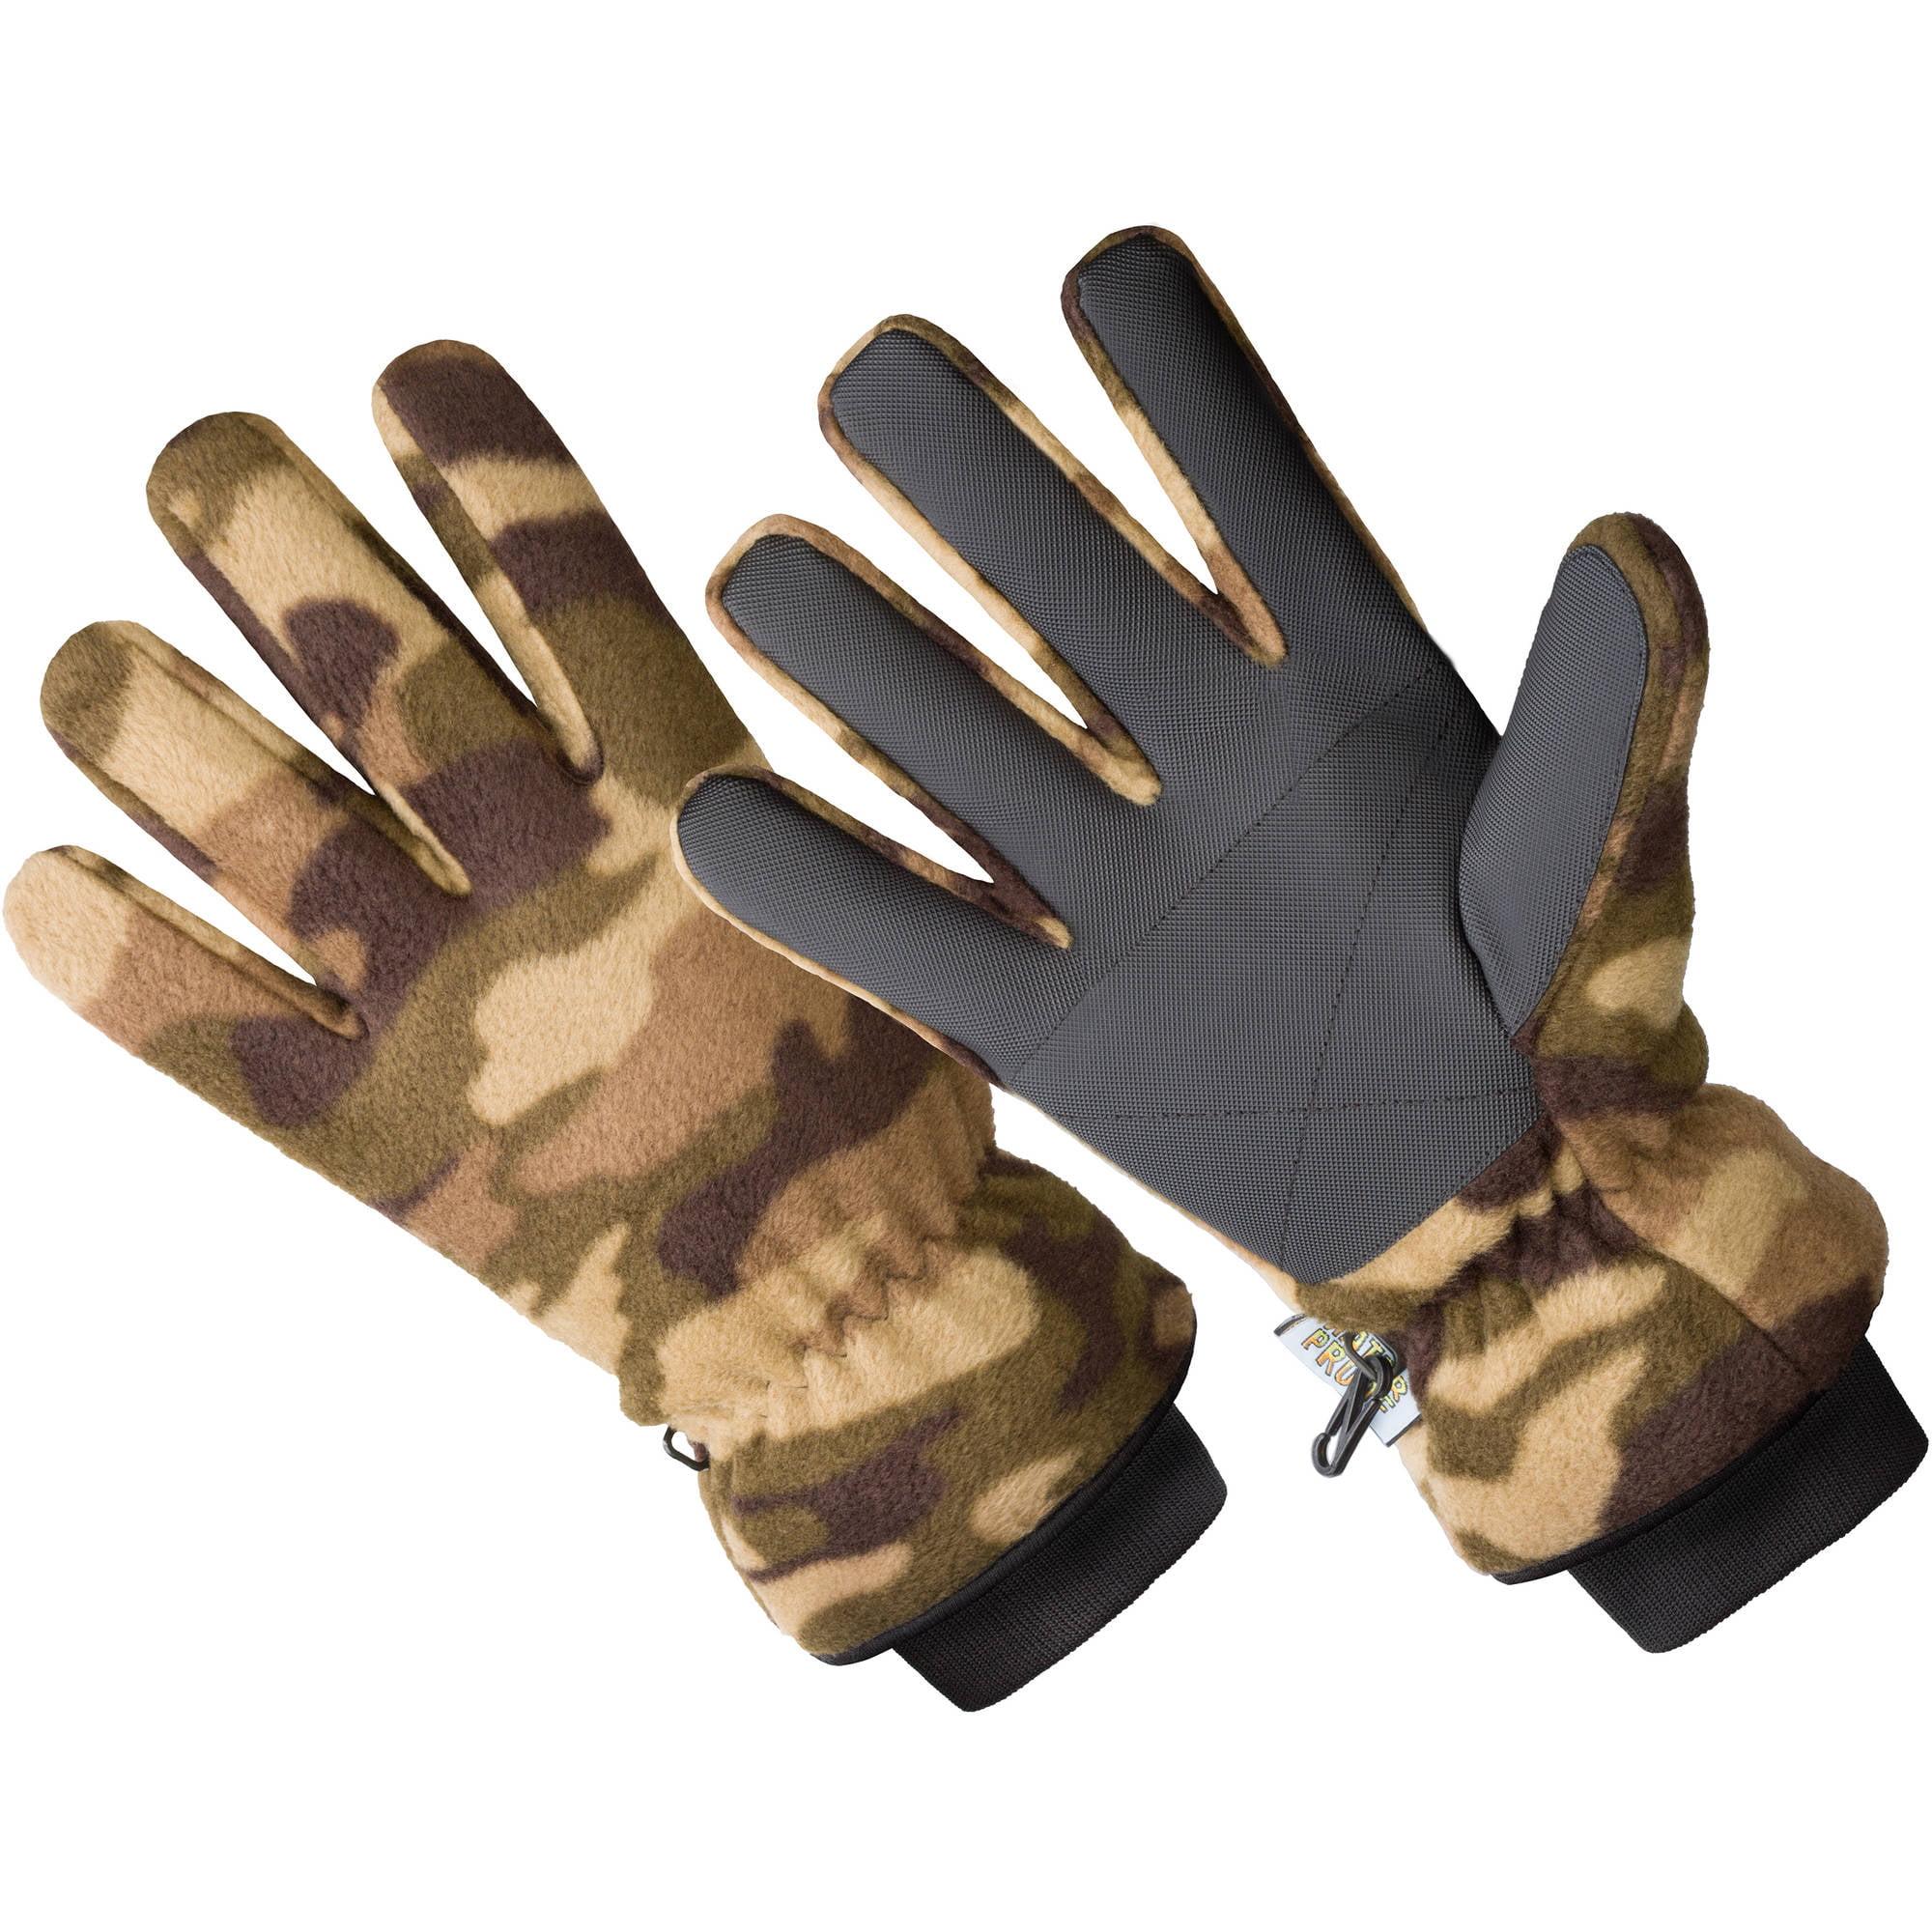 HANDS ON Micro Fleece Glove - 40 gm 3M Thinsulate Lined, 100% Waterproof